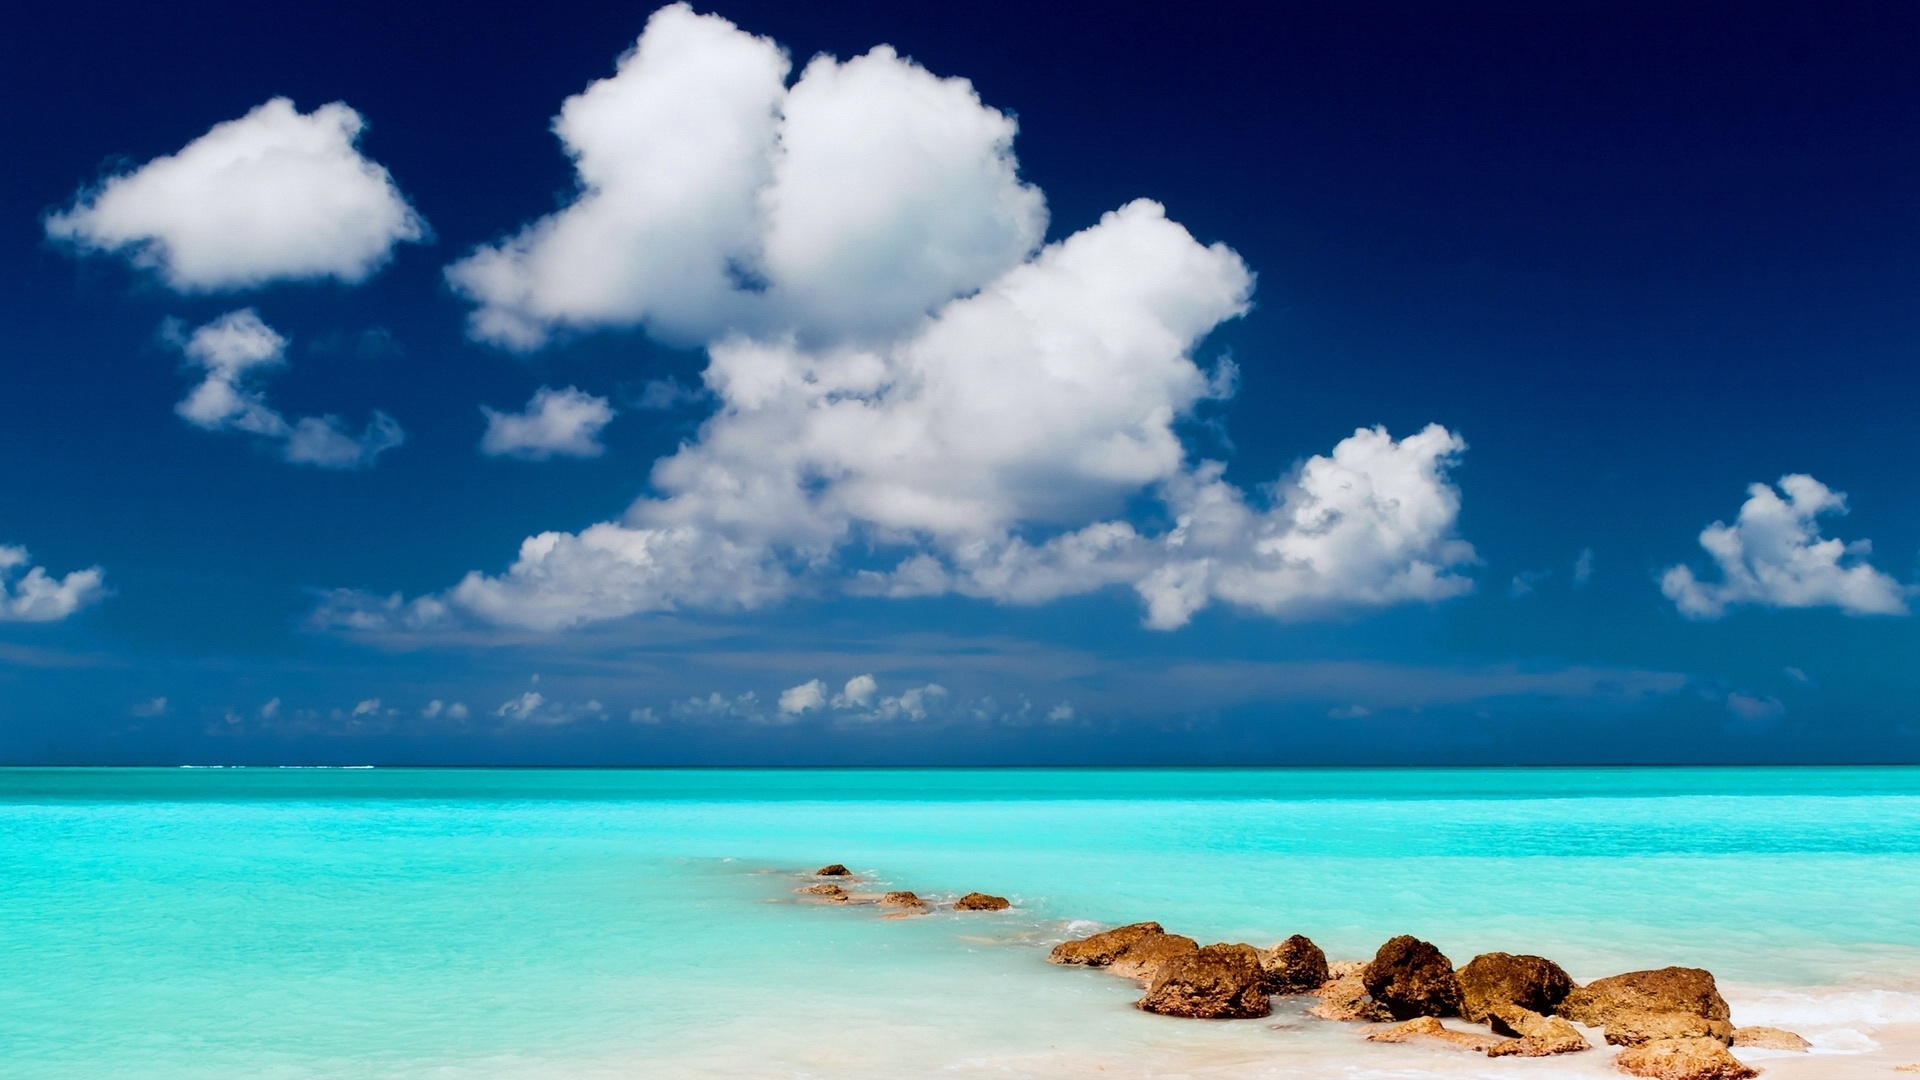 Beach free image